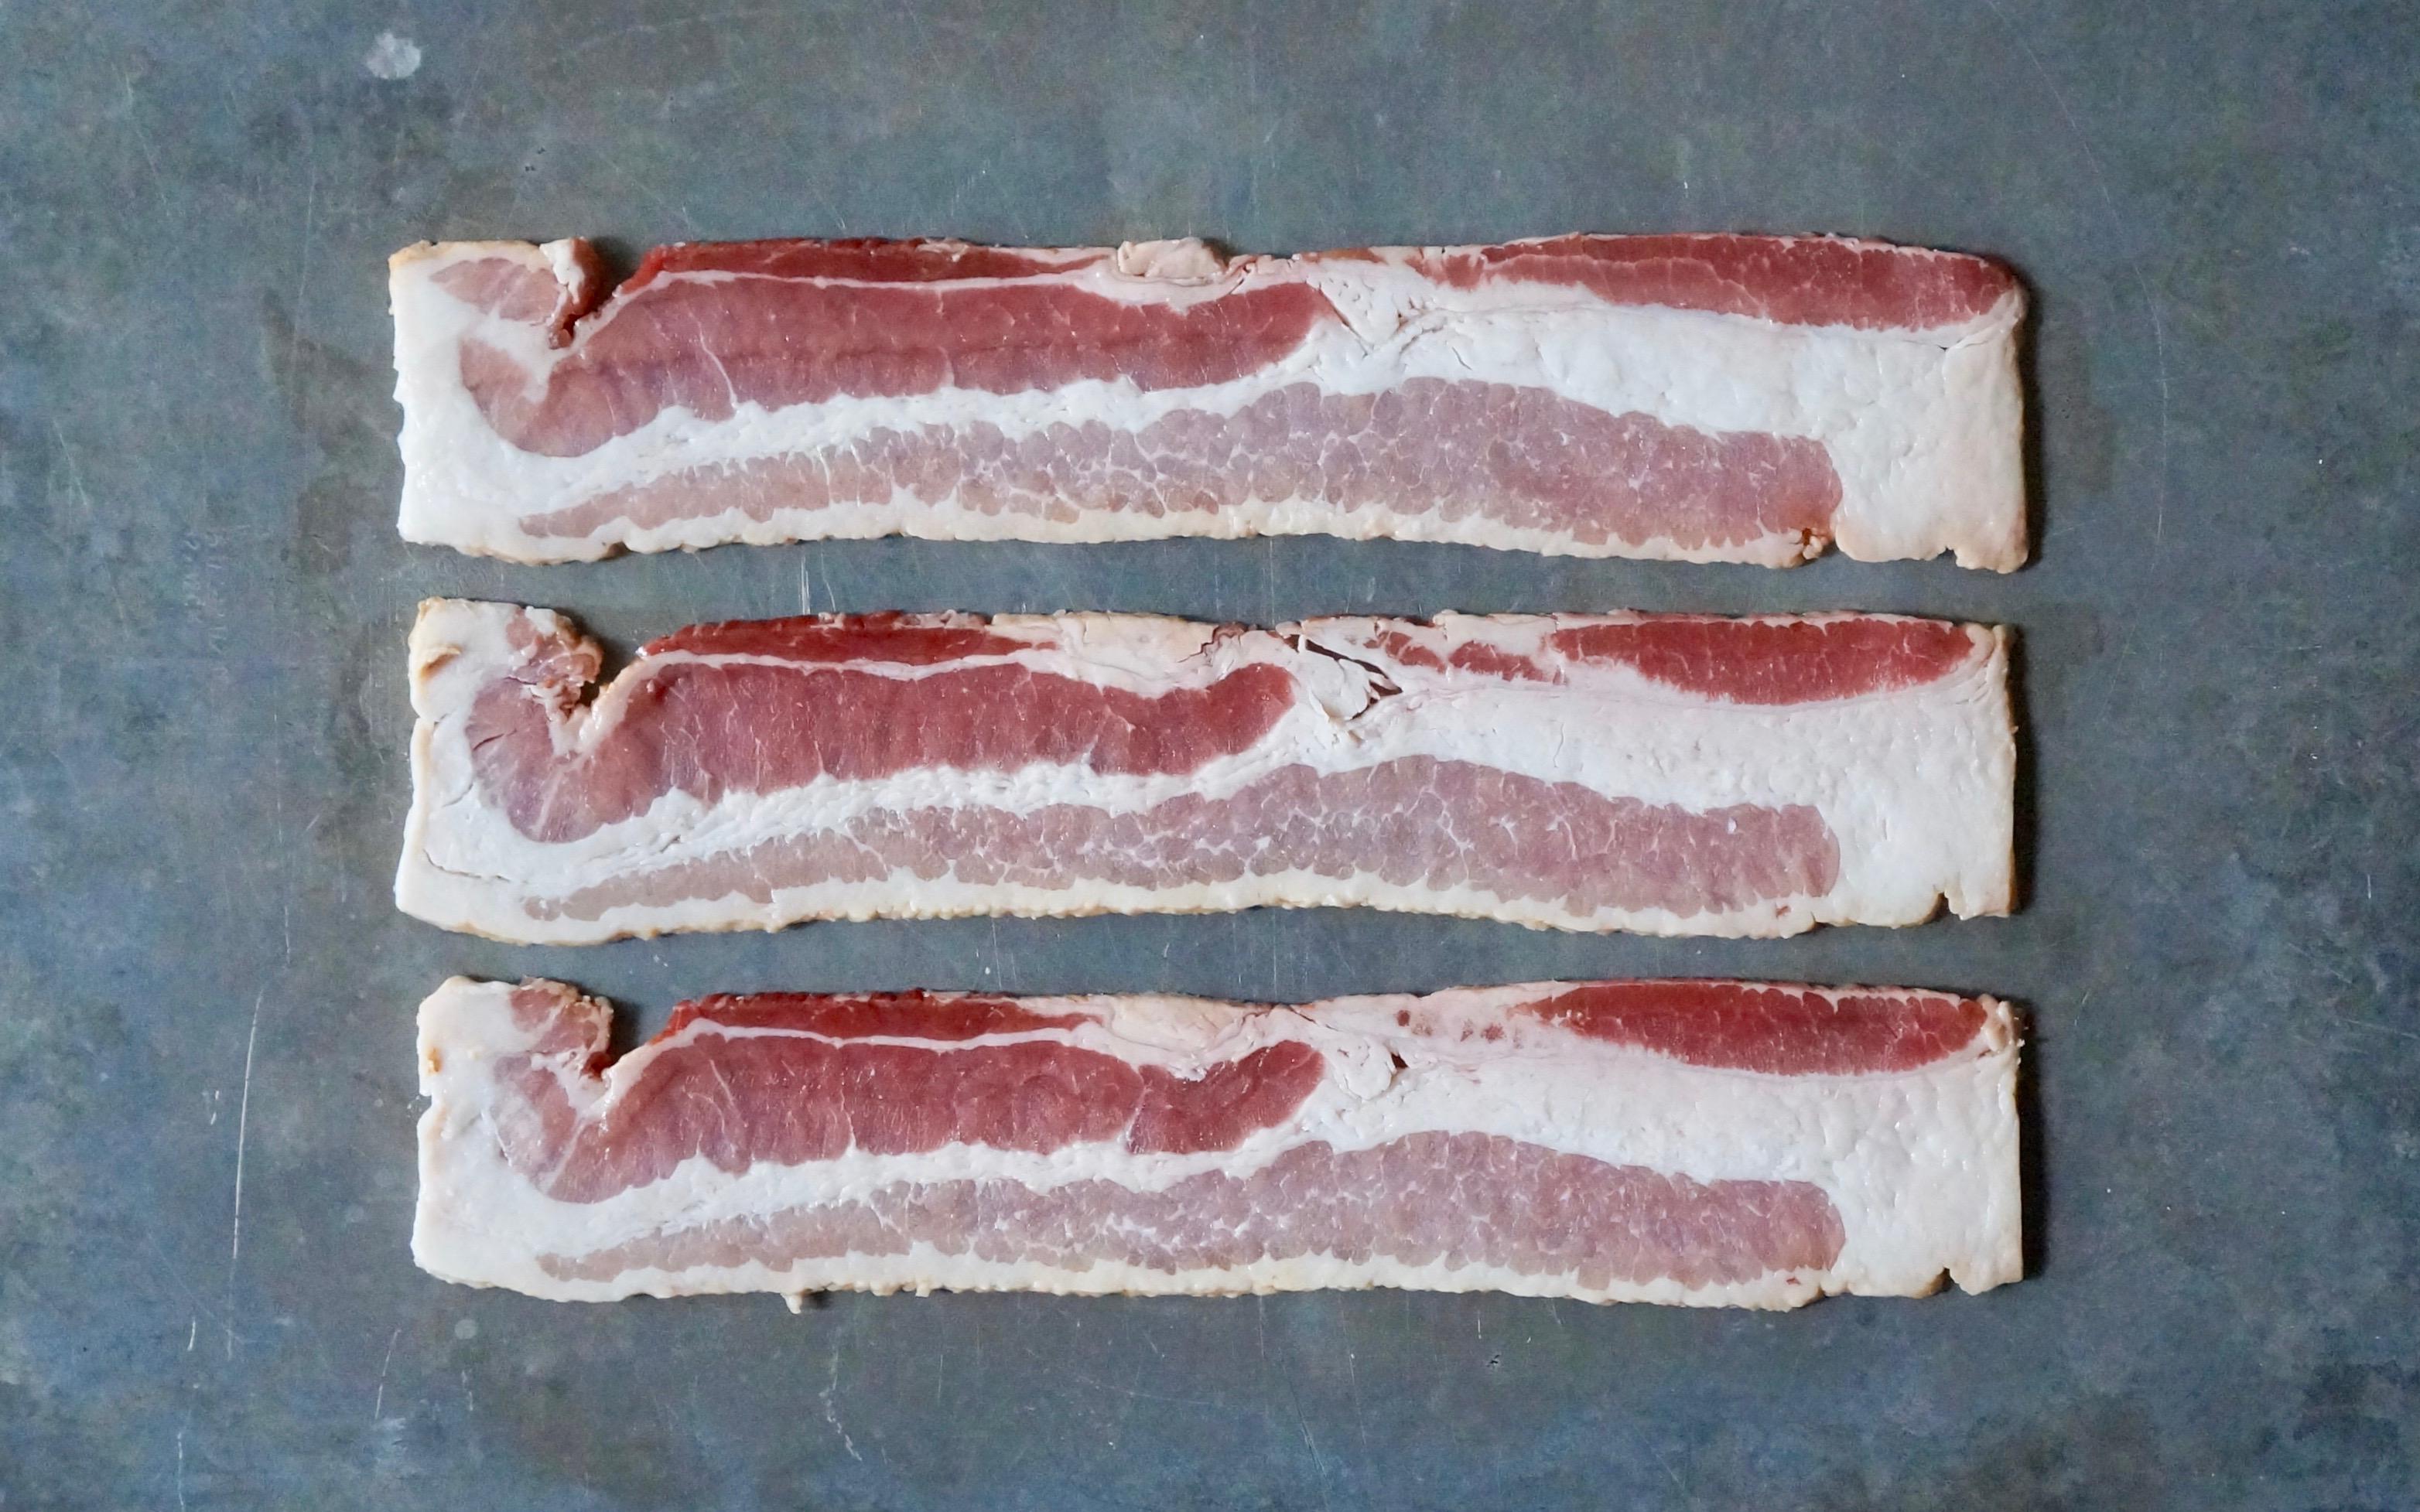 How-To-Cook-Bacon-Rebecca-Gordon-Publisher-Buttermilk-Lipstick-Culinary-Entertaining-Technique-RebeccaGordon-Pastry-Chef-Birmingham-Alabama